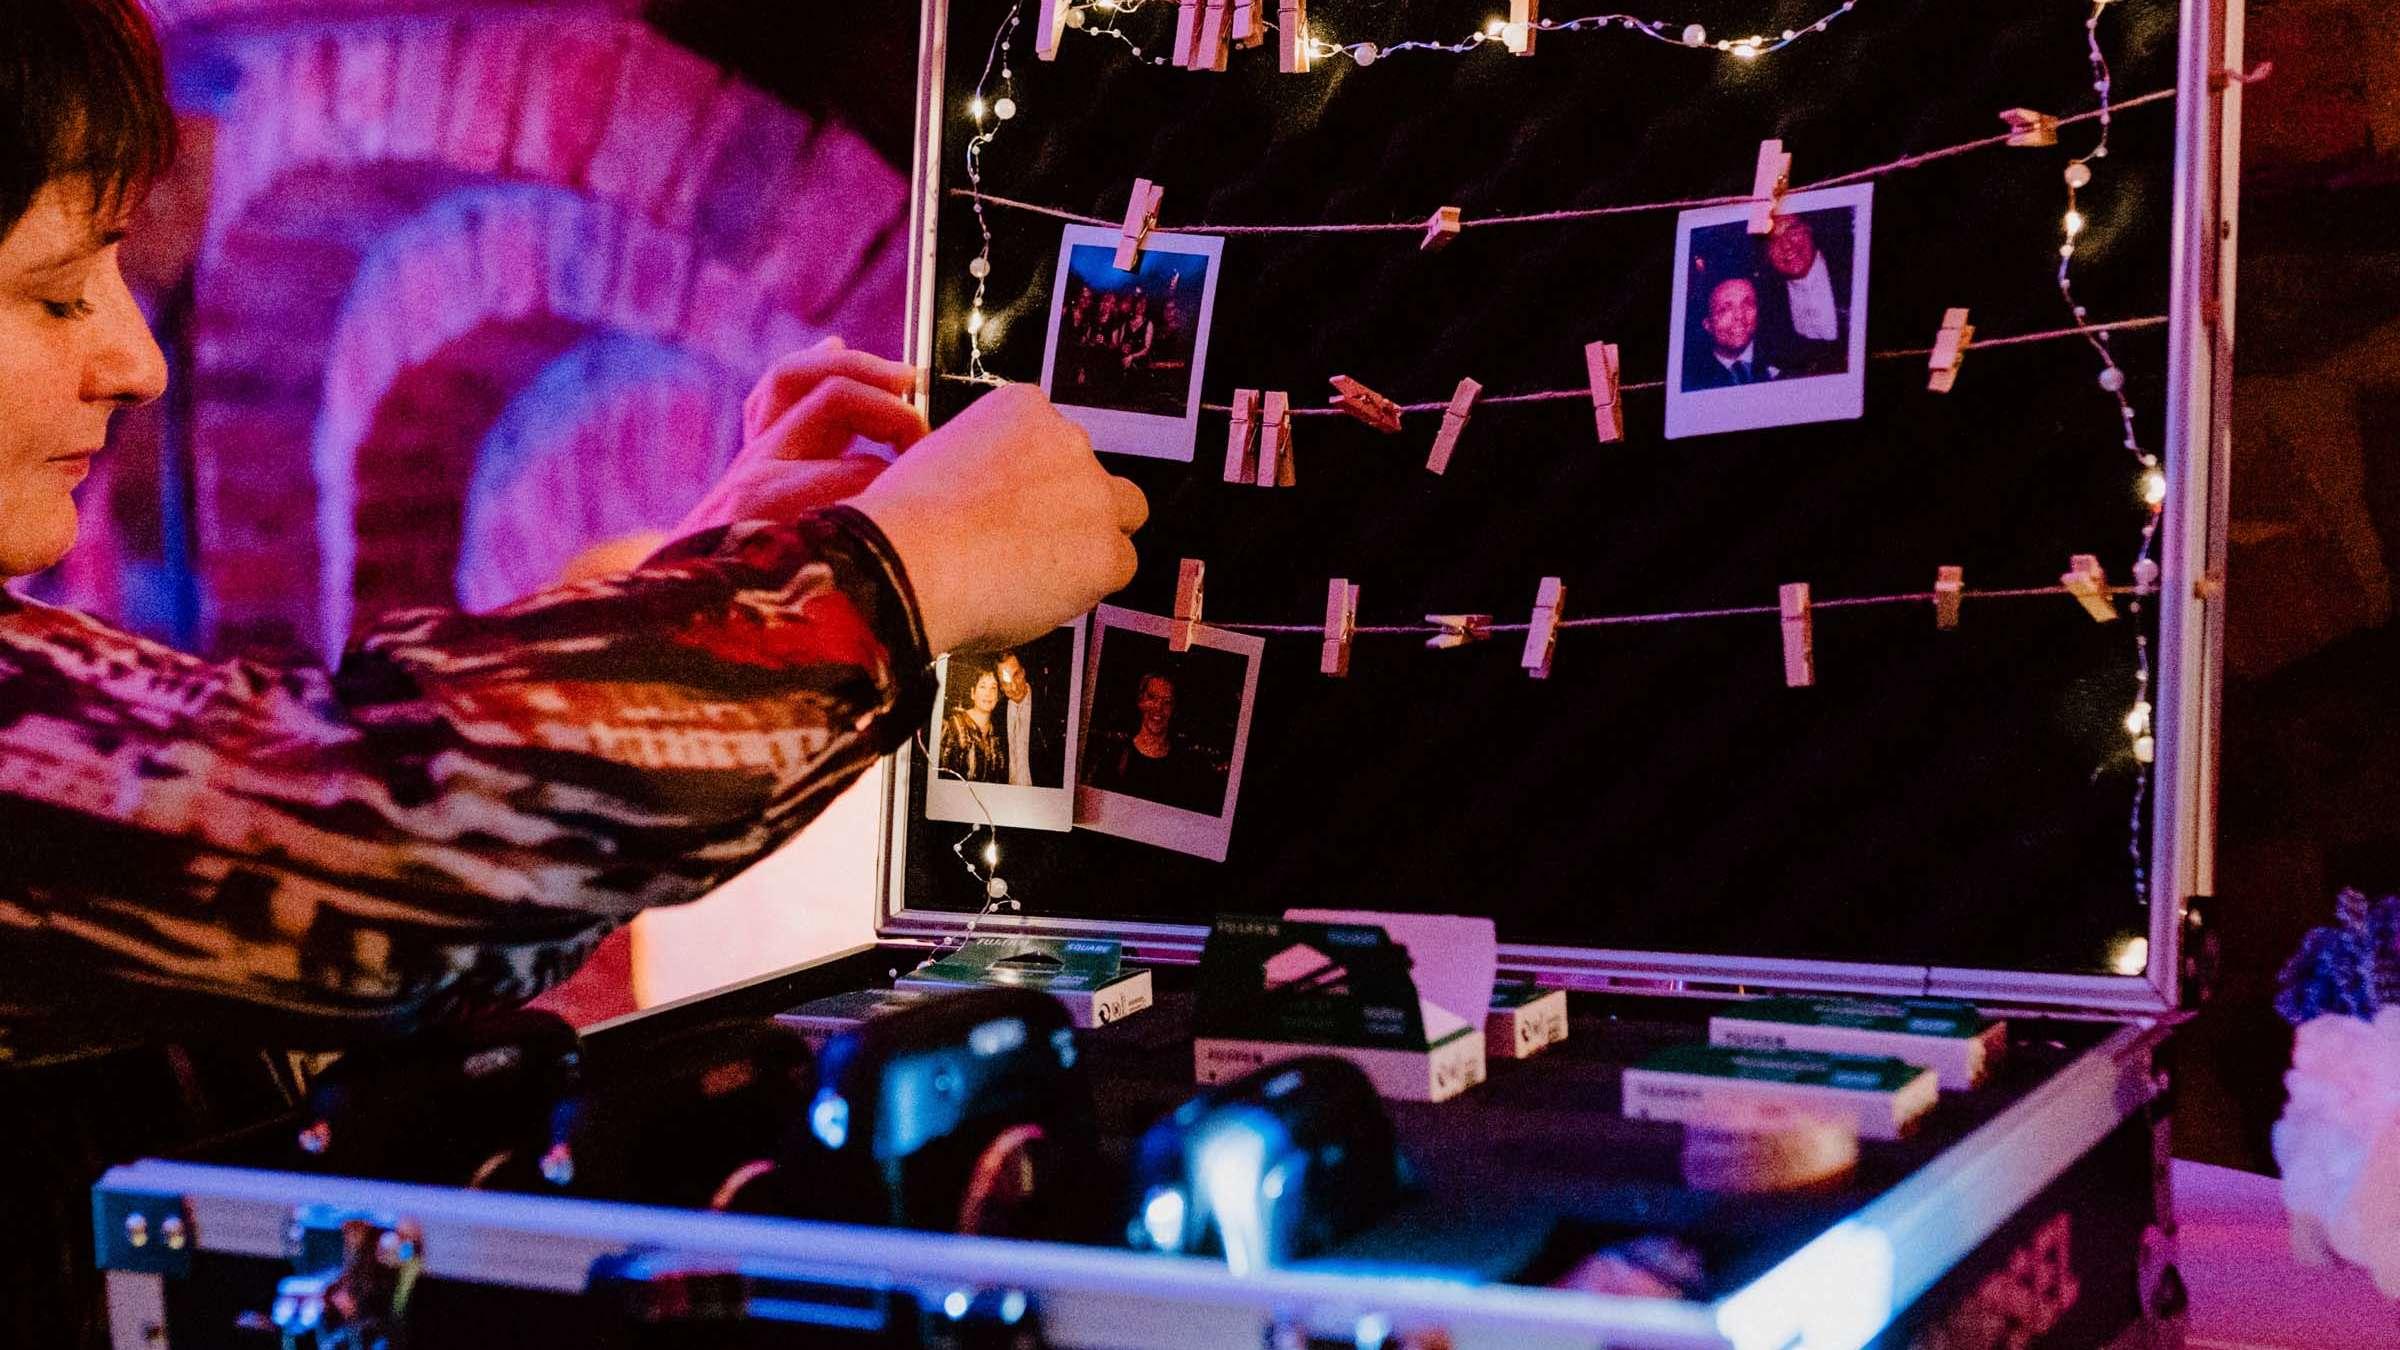 Lehmann |Eventservice |Hannover |Partner |Knipsel |Polaroid |Kamera |Mieten |Hochzeit |Polaroid |Fotograf |Set |Event |Mieten |Instax |Leihen |Event |Hochzeit |Sofortbildkamera